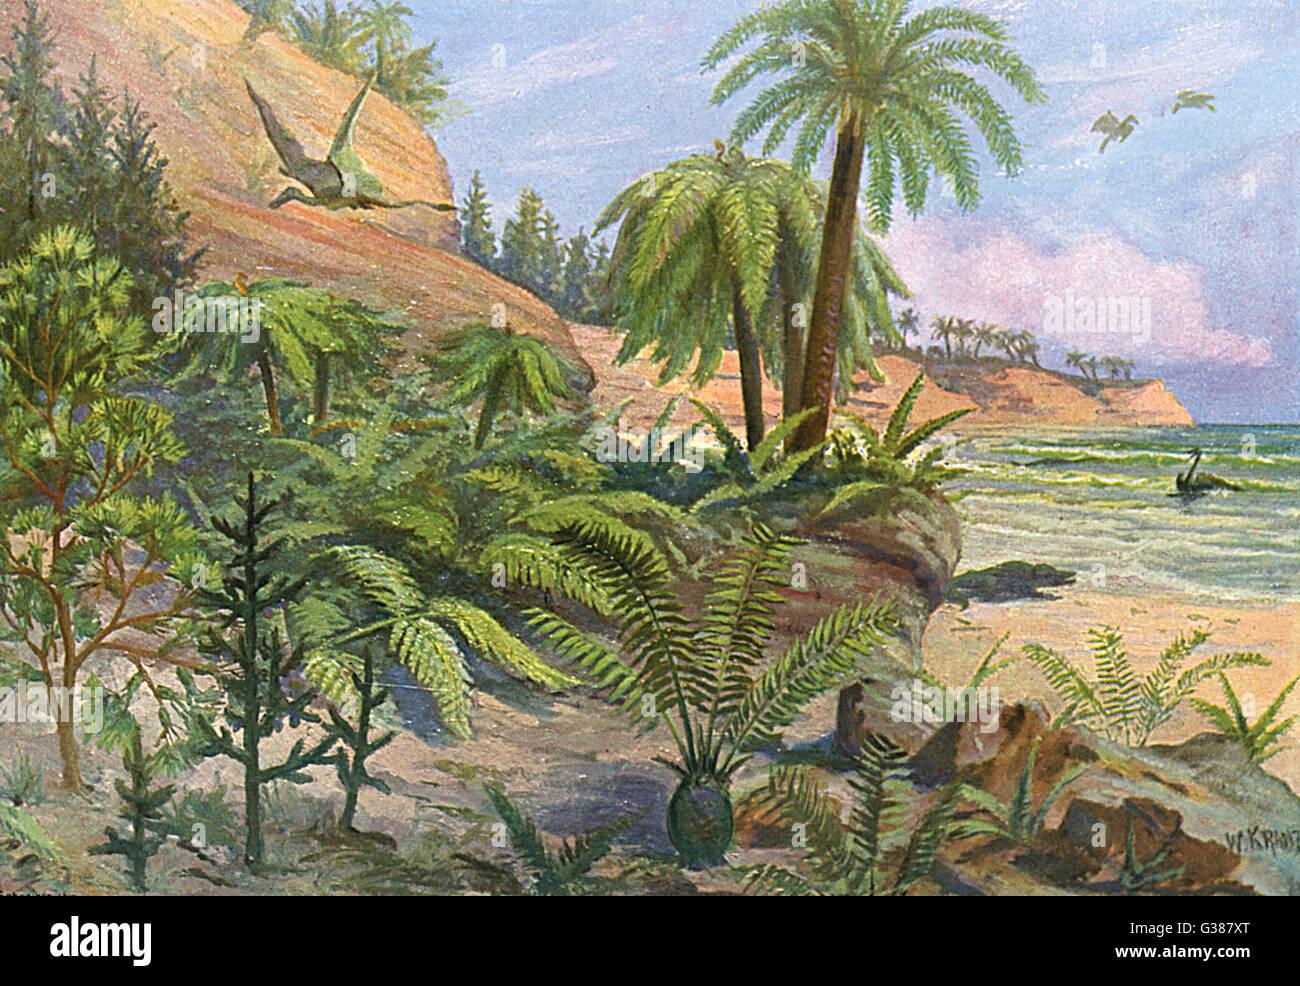 Un paisaje jurásico Fecha: 208-146 millones de a.c. Imagen De Stock